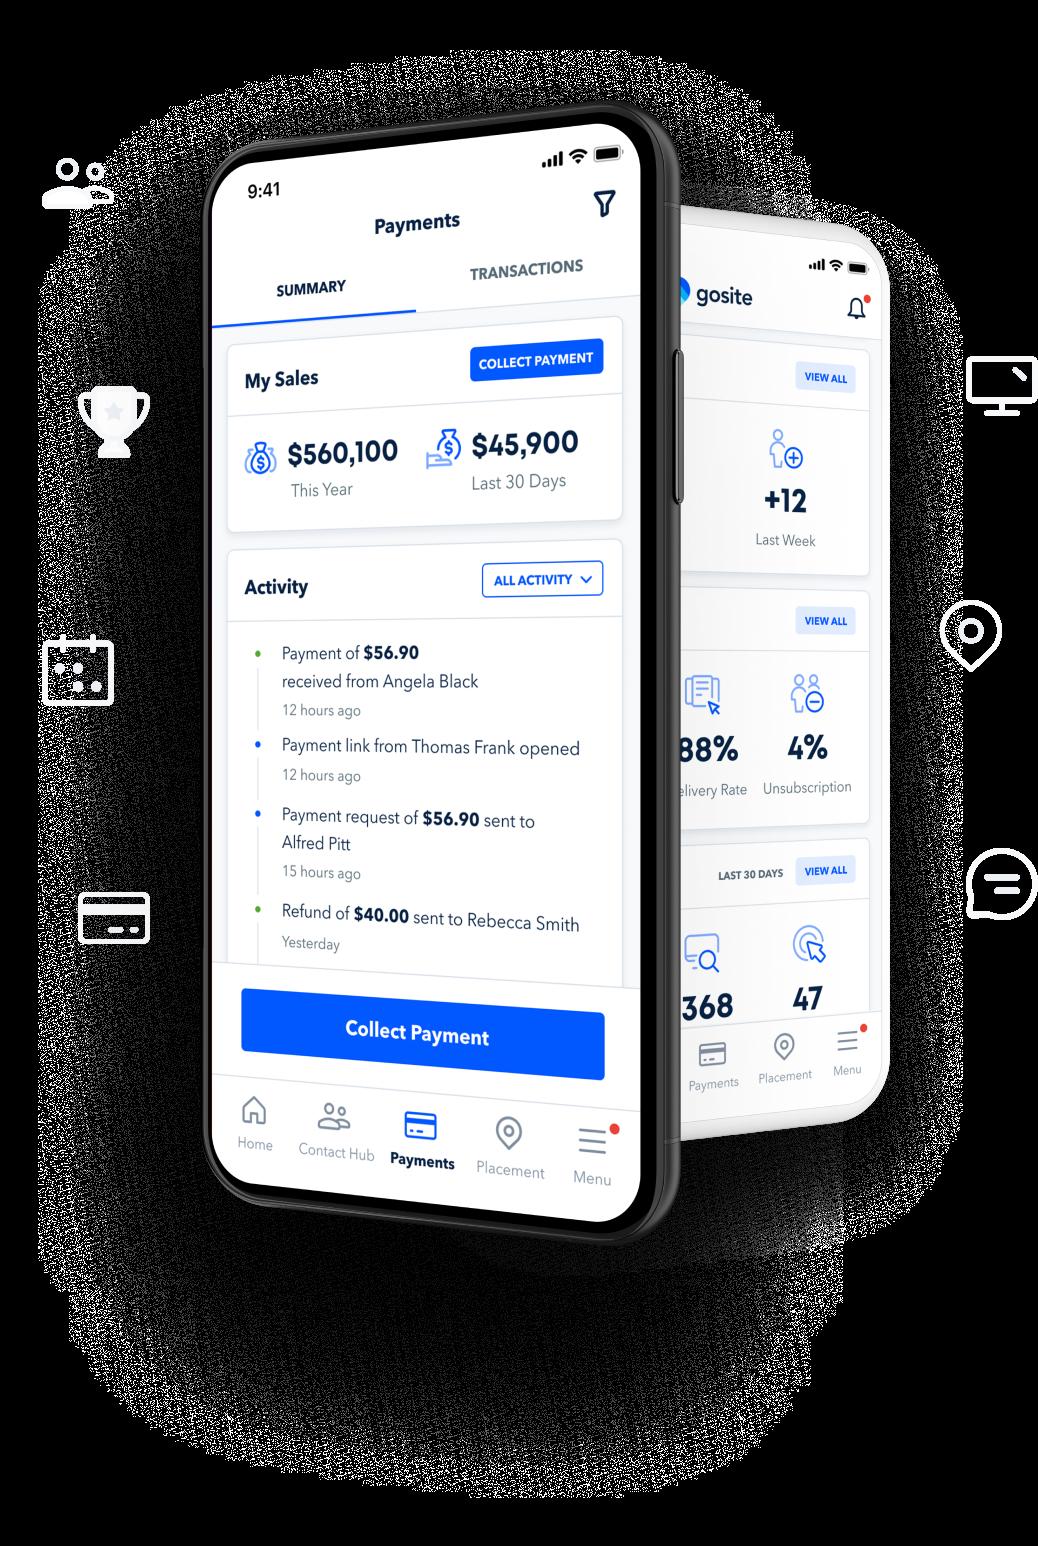 GoSite app on mobile phone